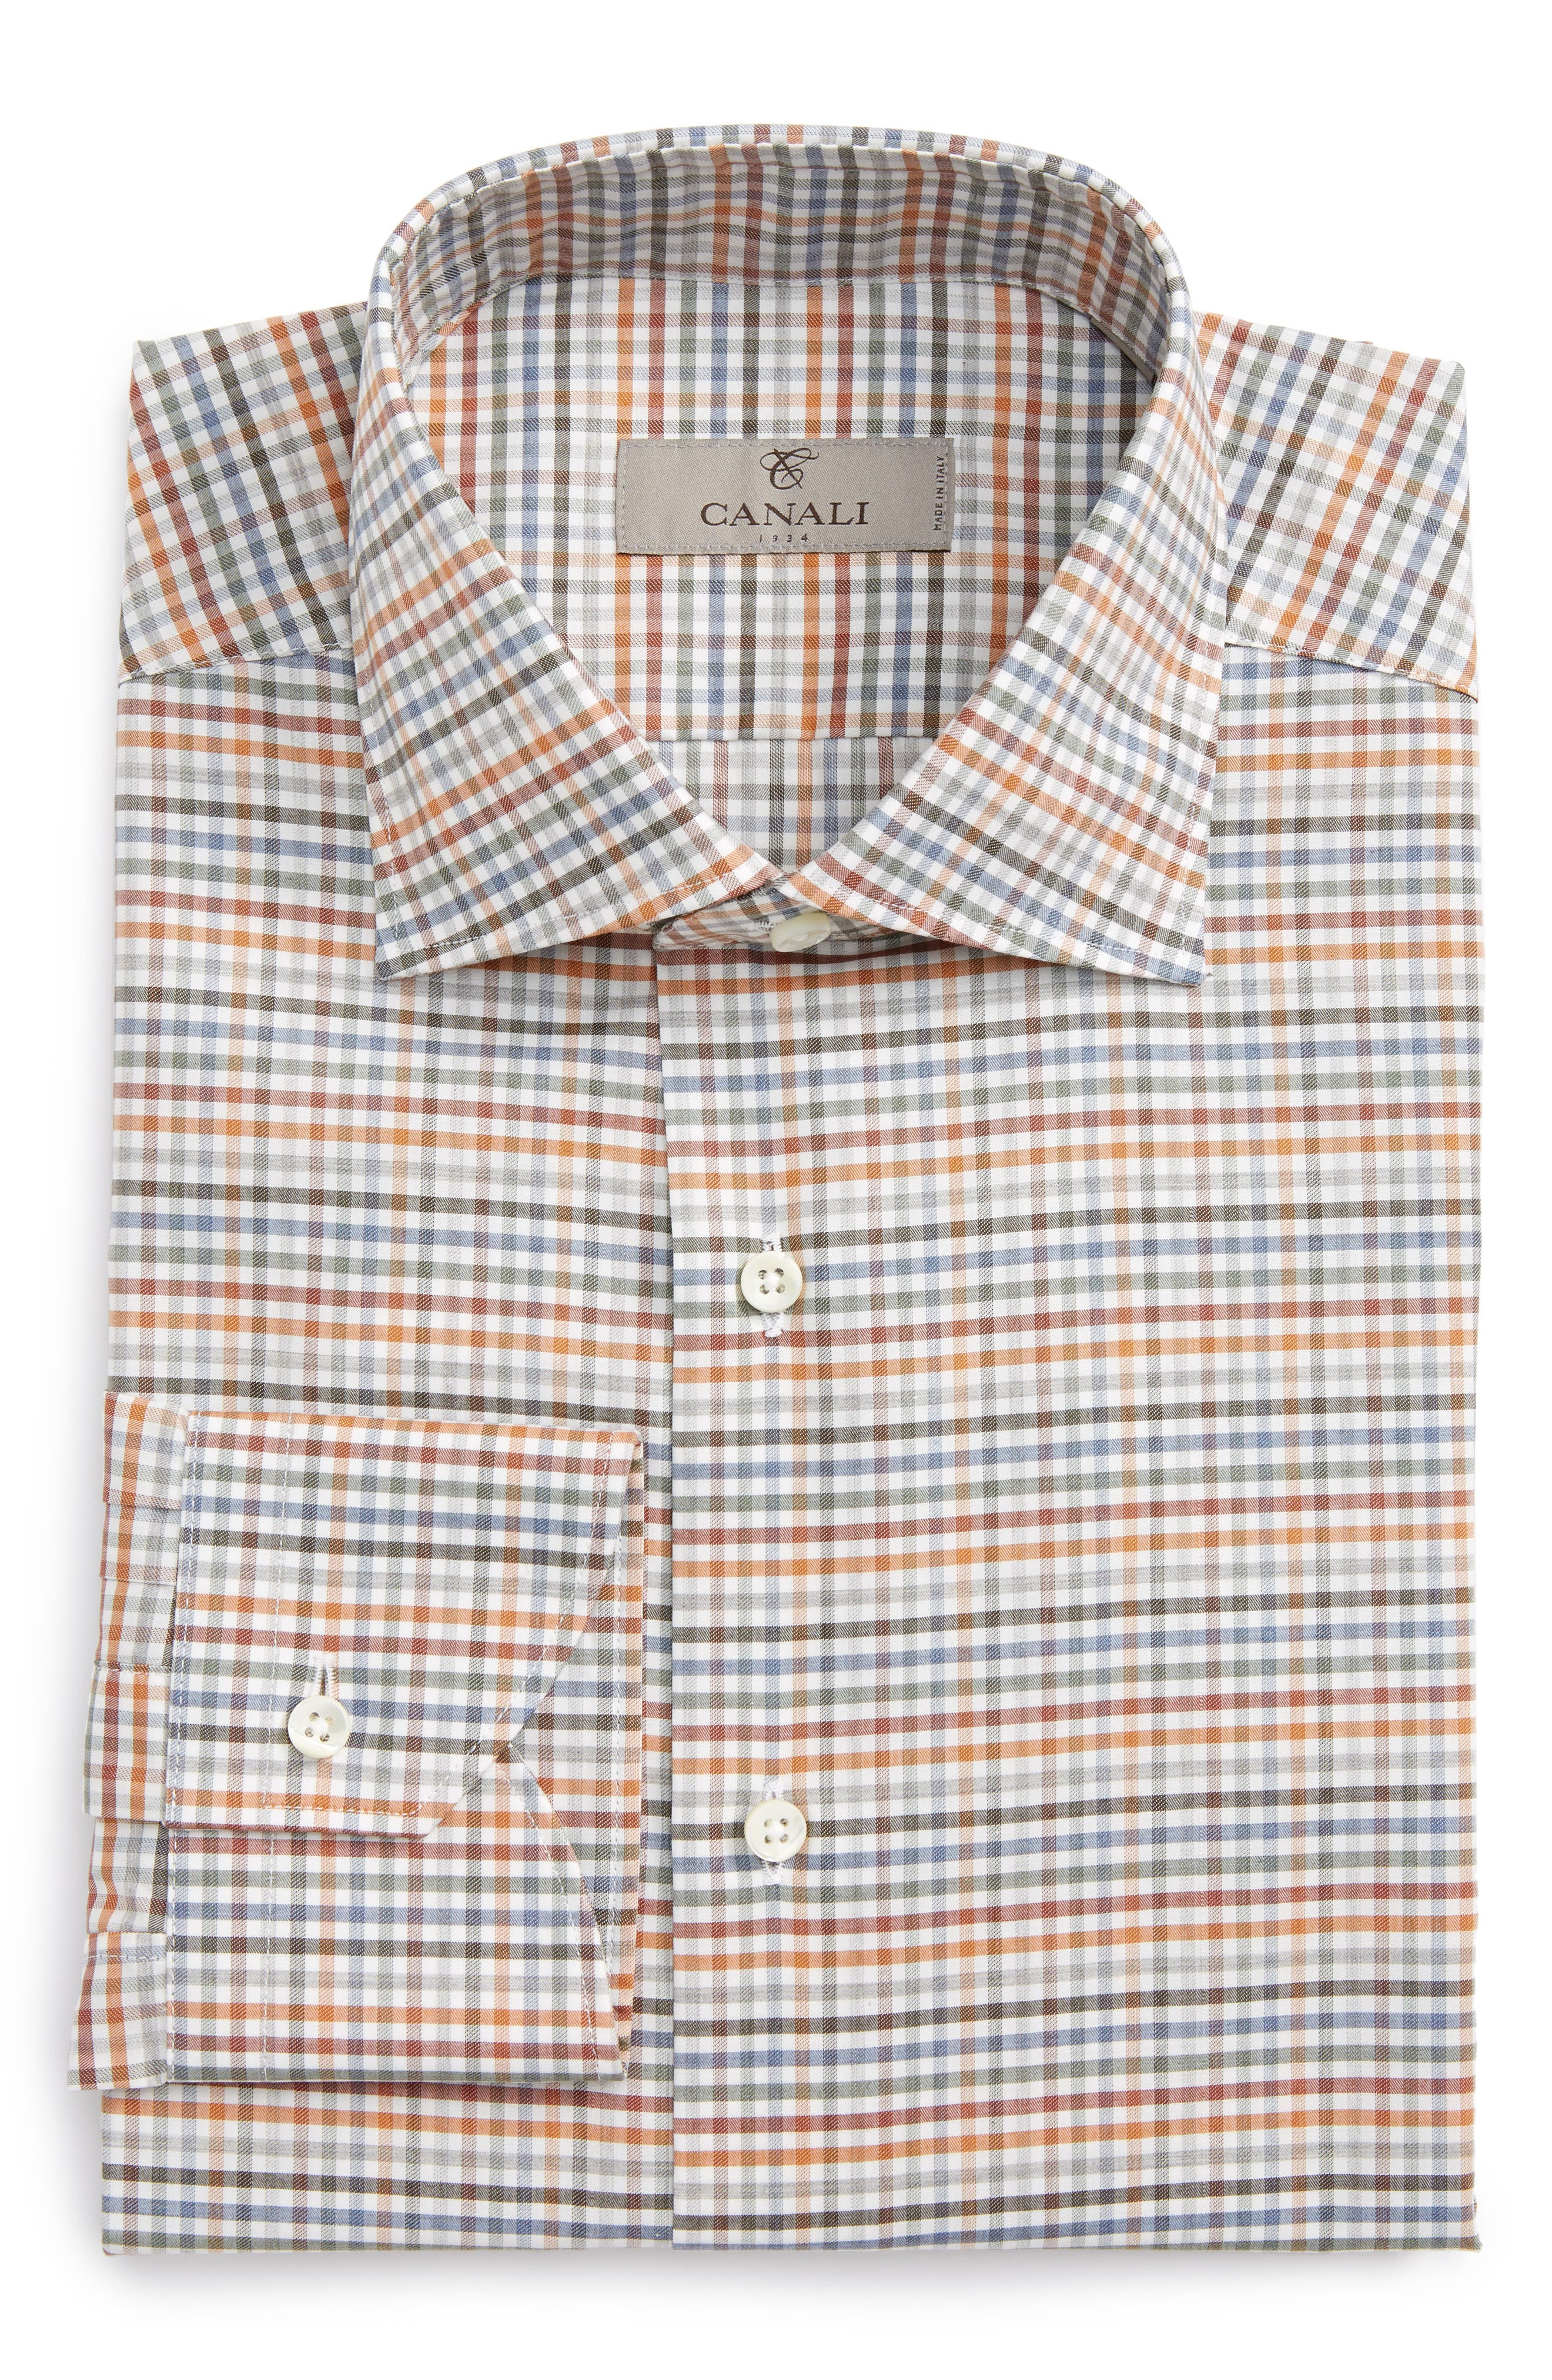 Regular Fit Check Dress Shirt,                         Main,                         color, 300